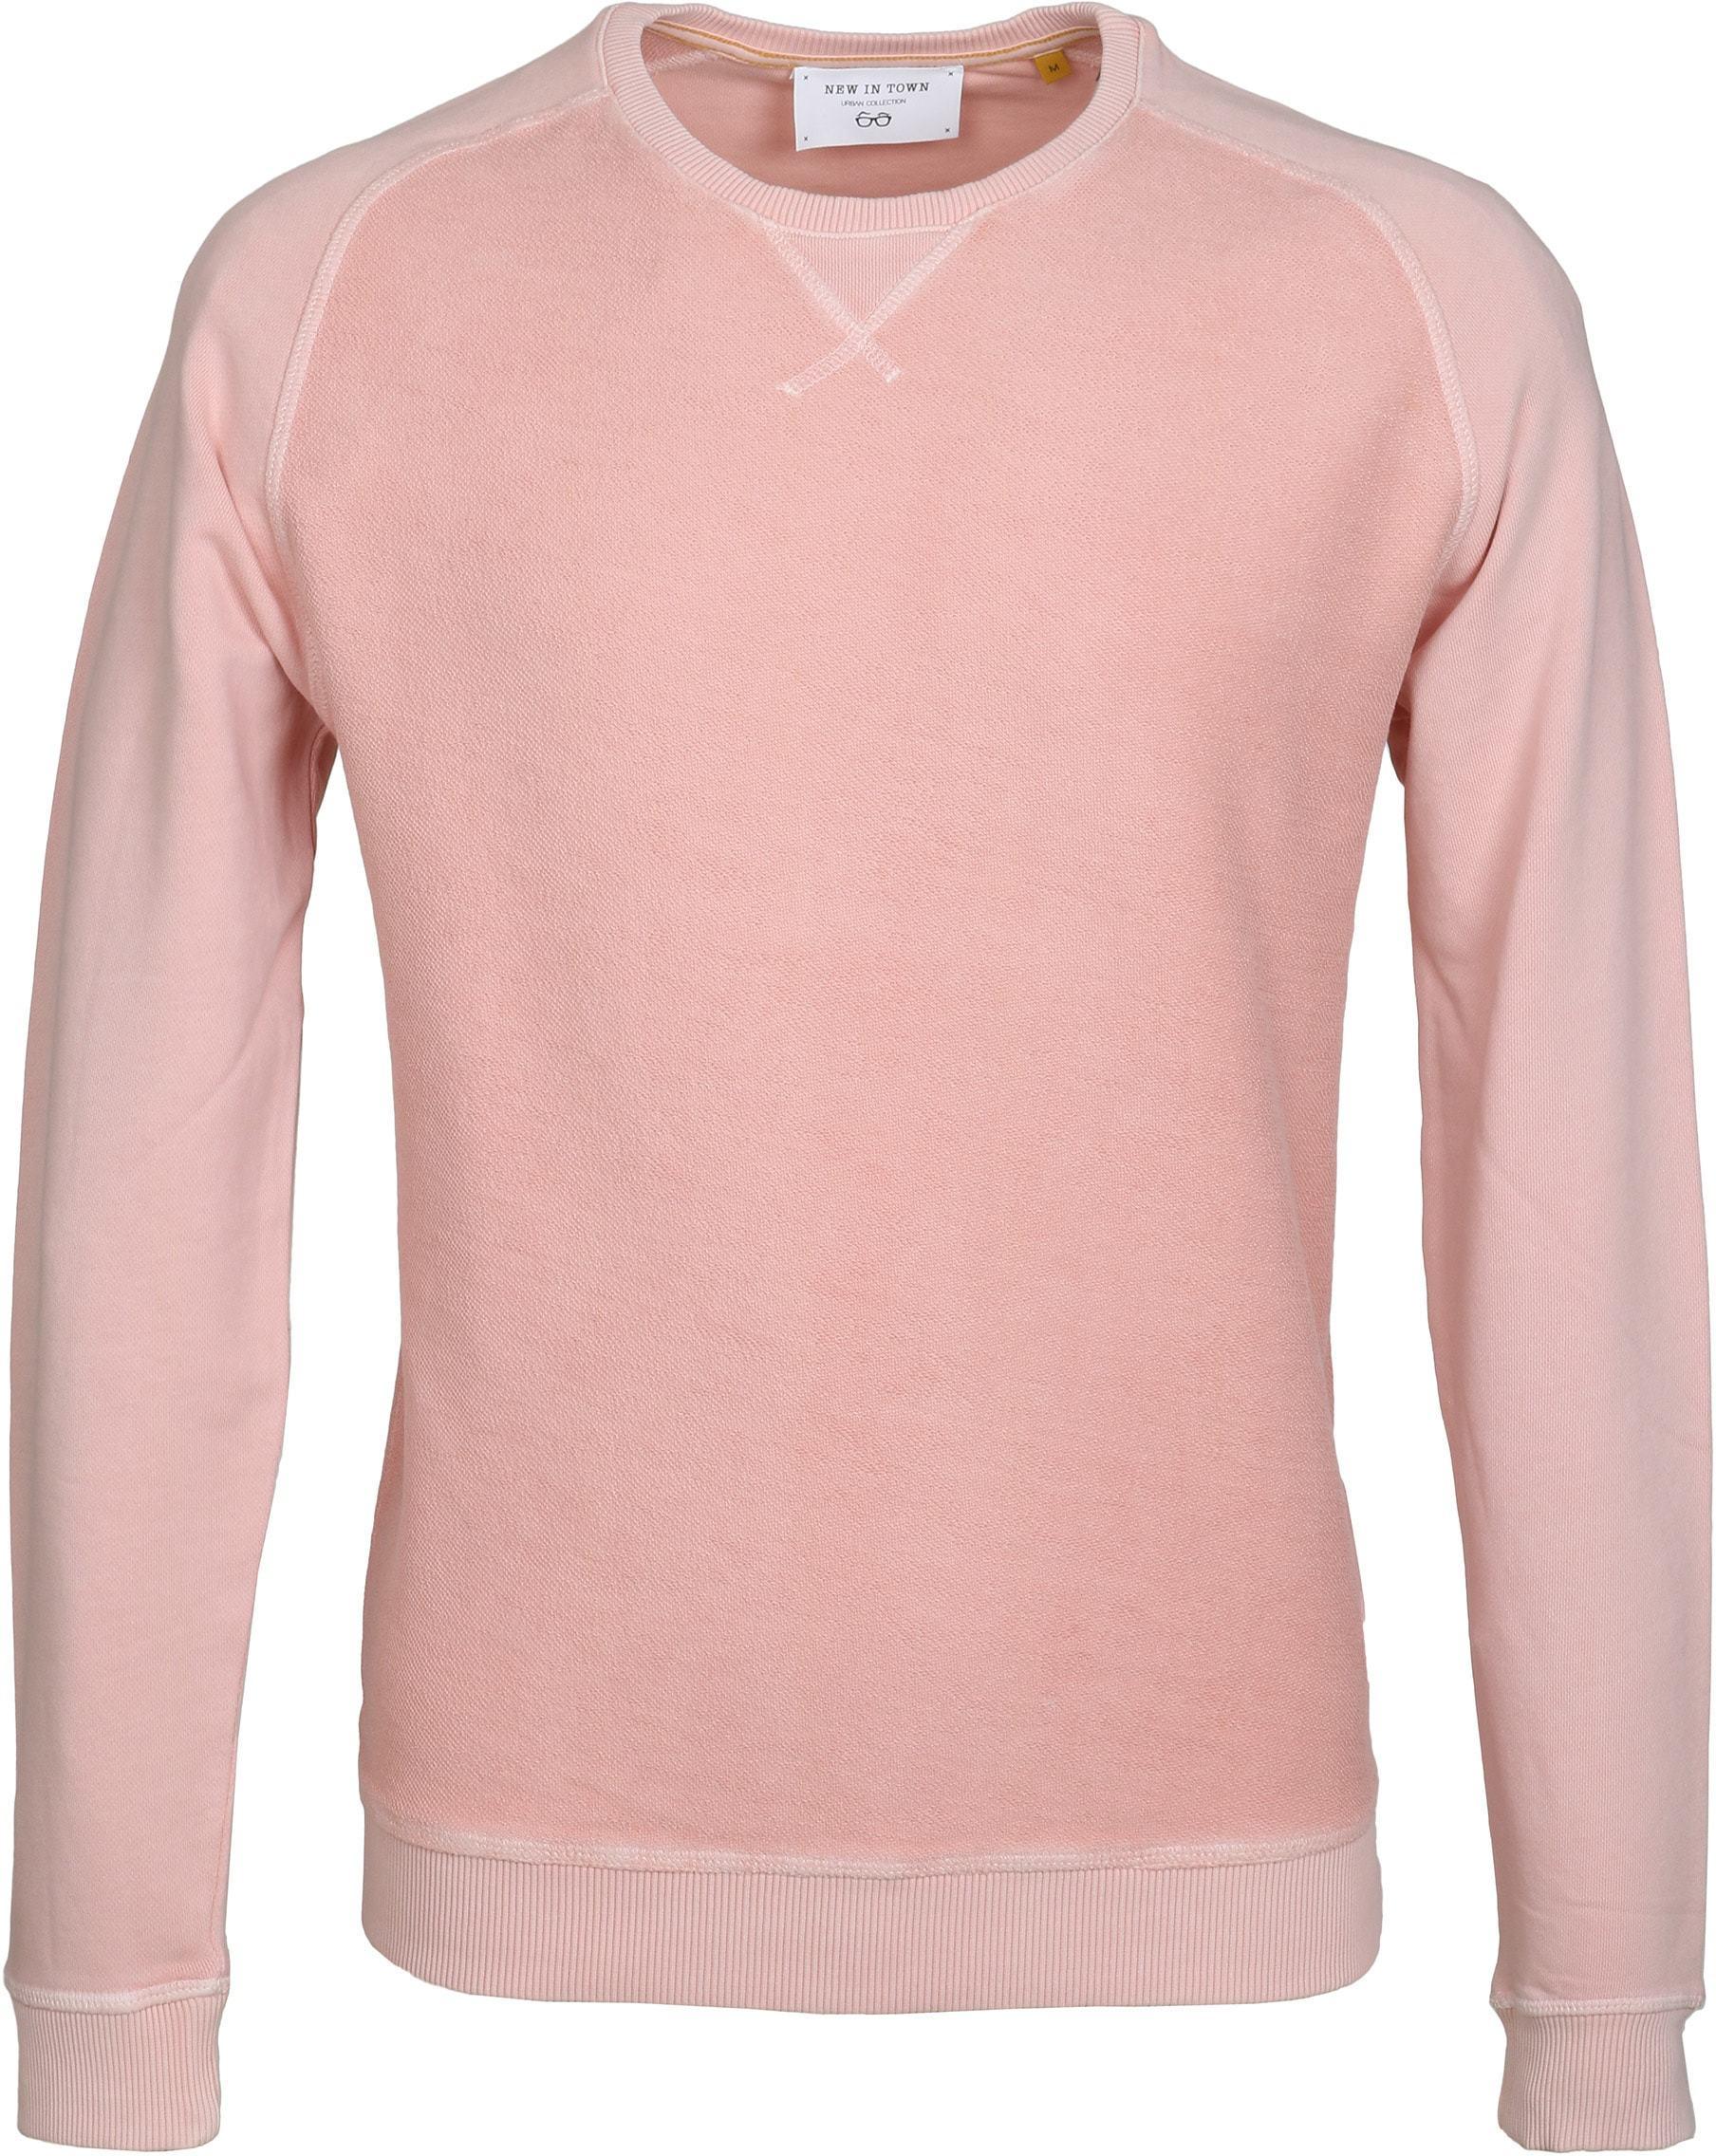 New In Town Sweater Roze foto 0